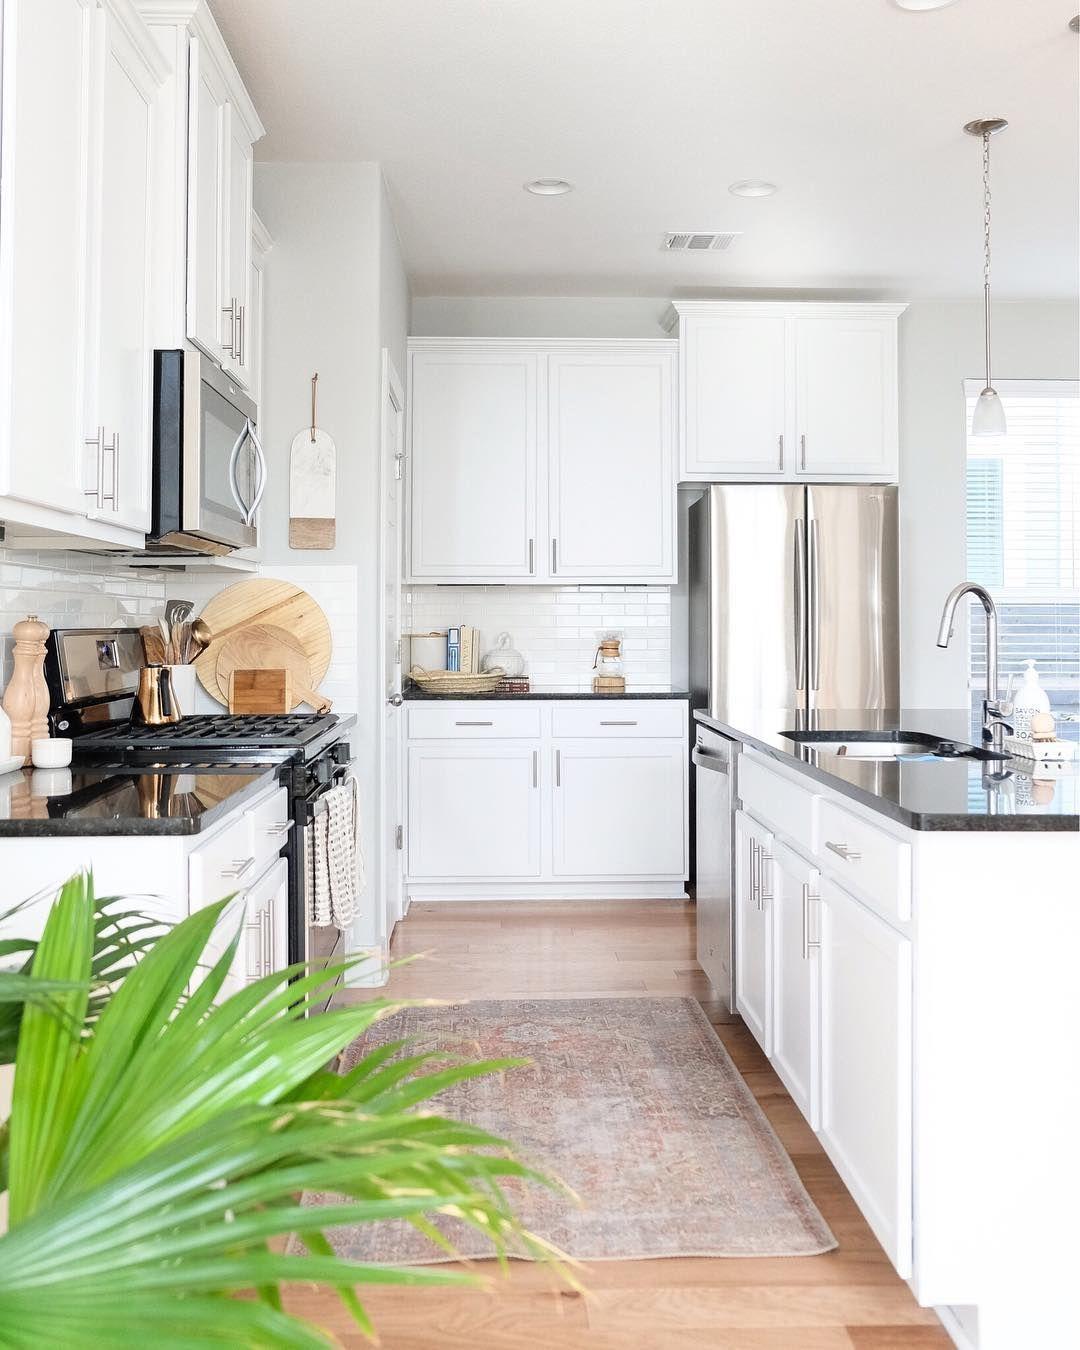 Bright White Coastal Kitchen With A Vintage Rug Rugmadetheroom